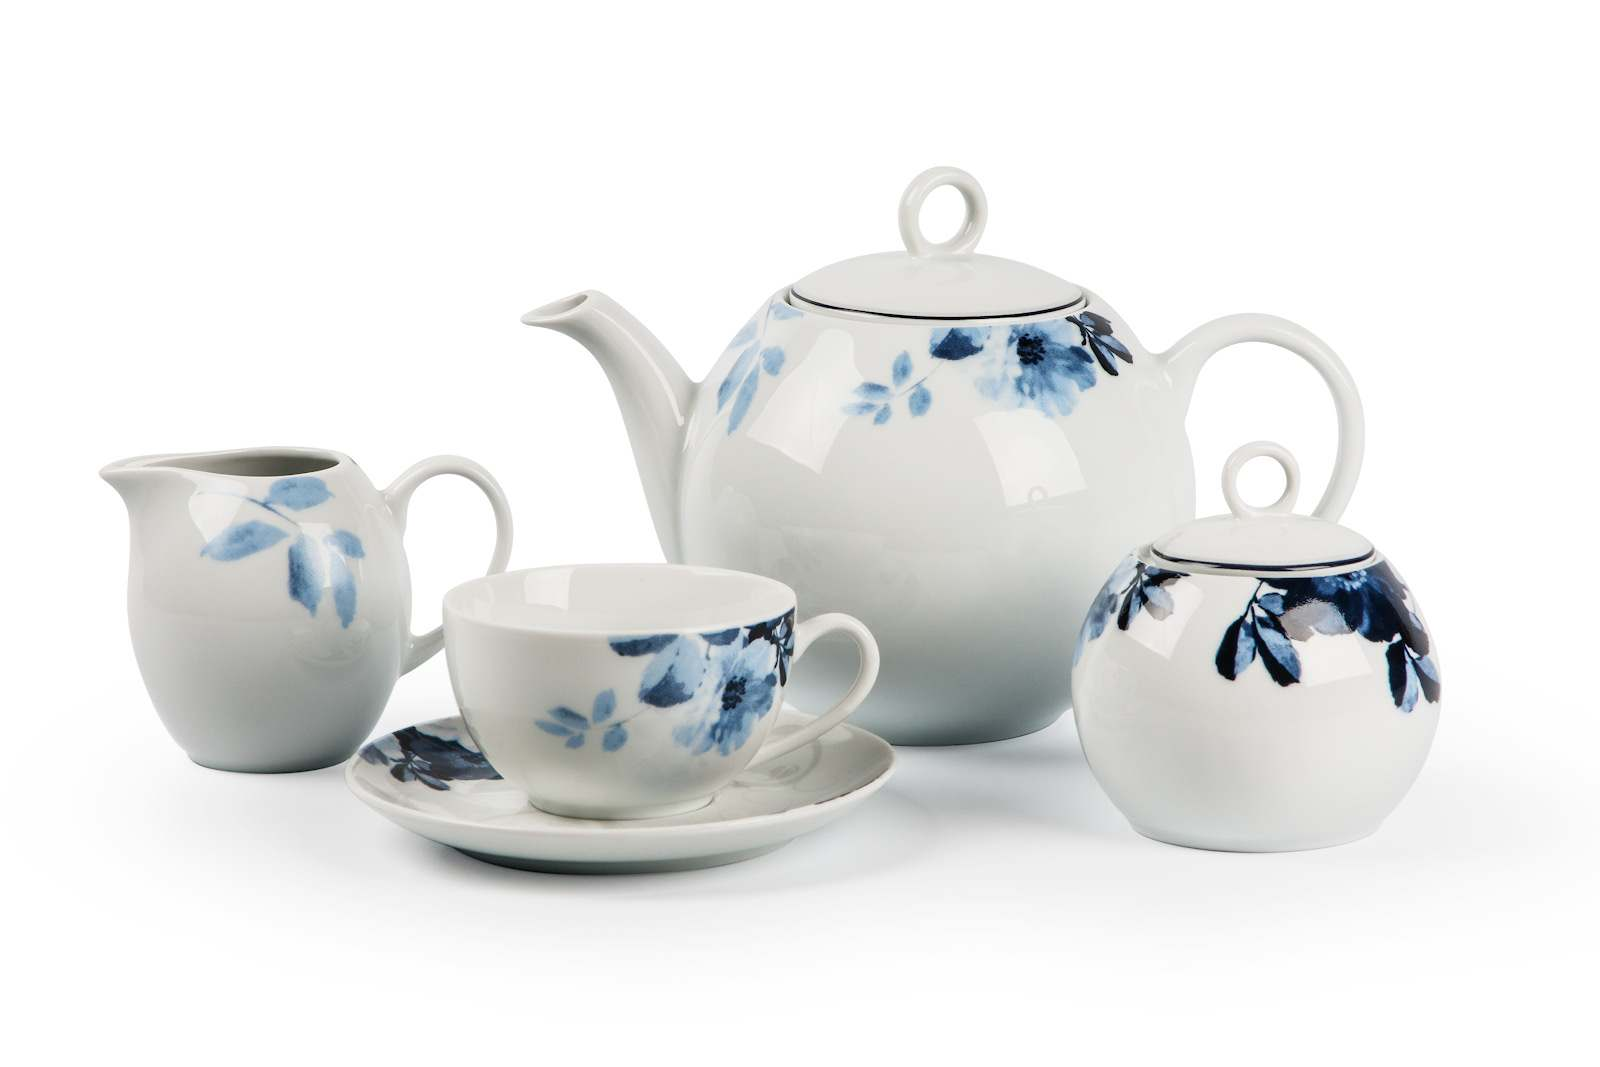 MONALISA 1780 Чайный Сервиз 15 предмета Jardin Bleu Тунис